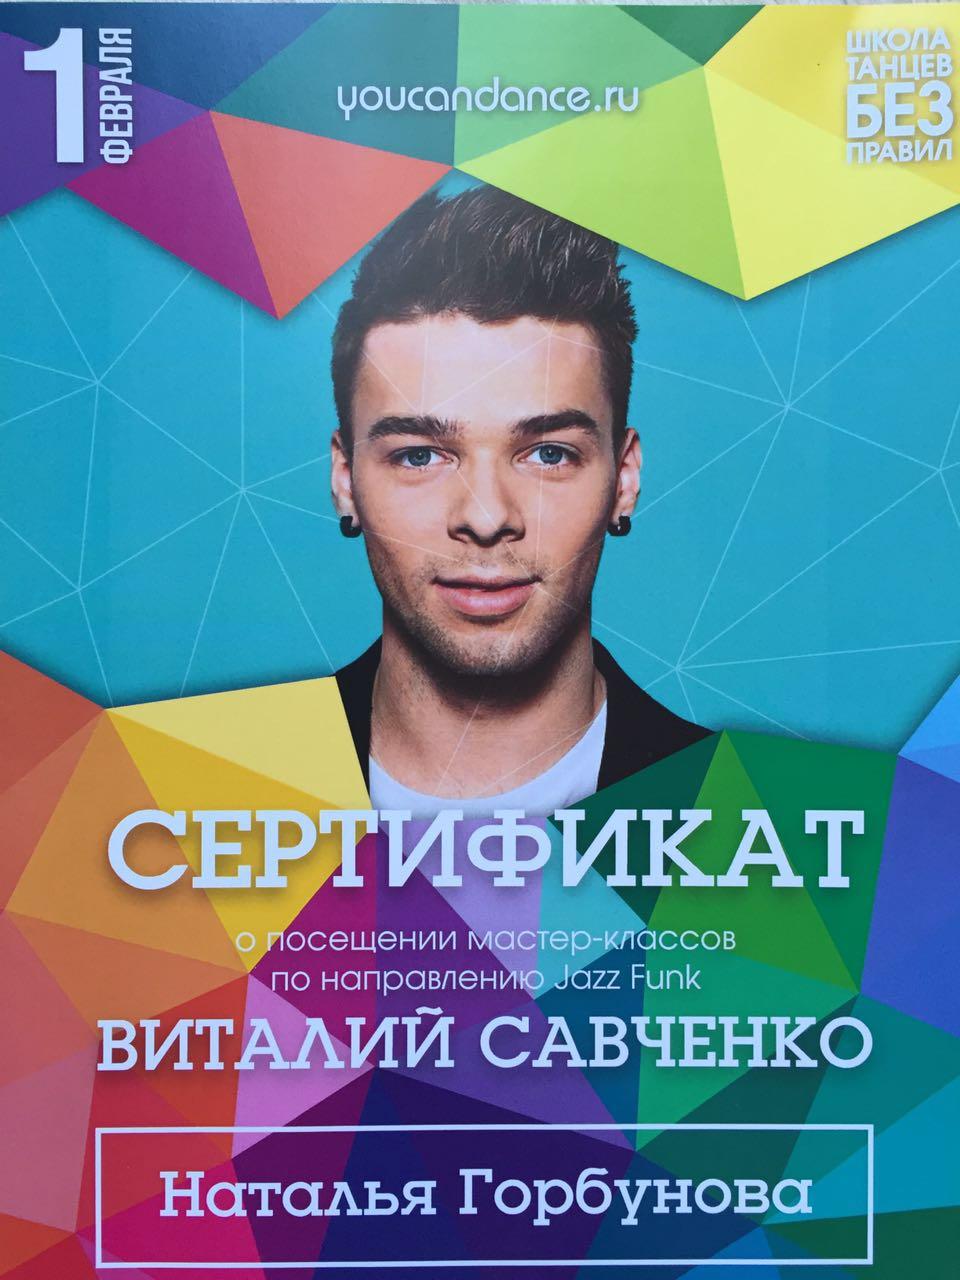 gorbonova_certificate5.jpeg